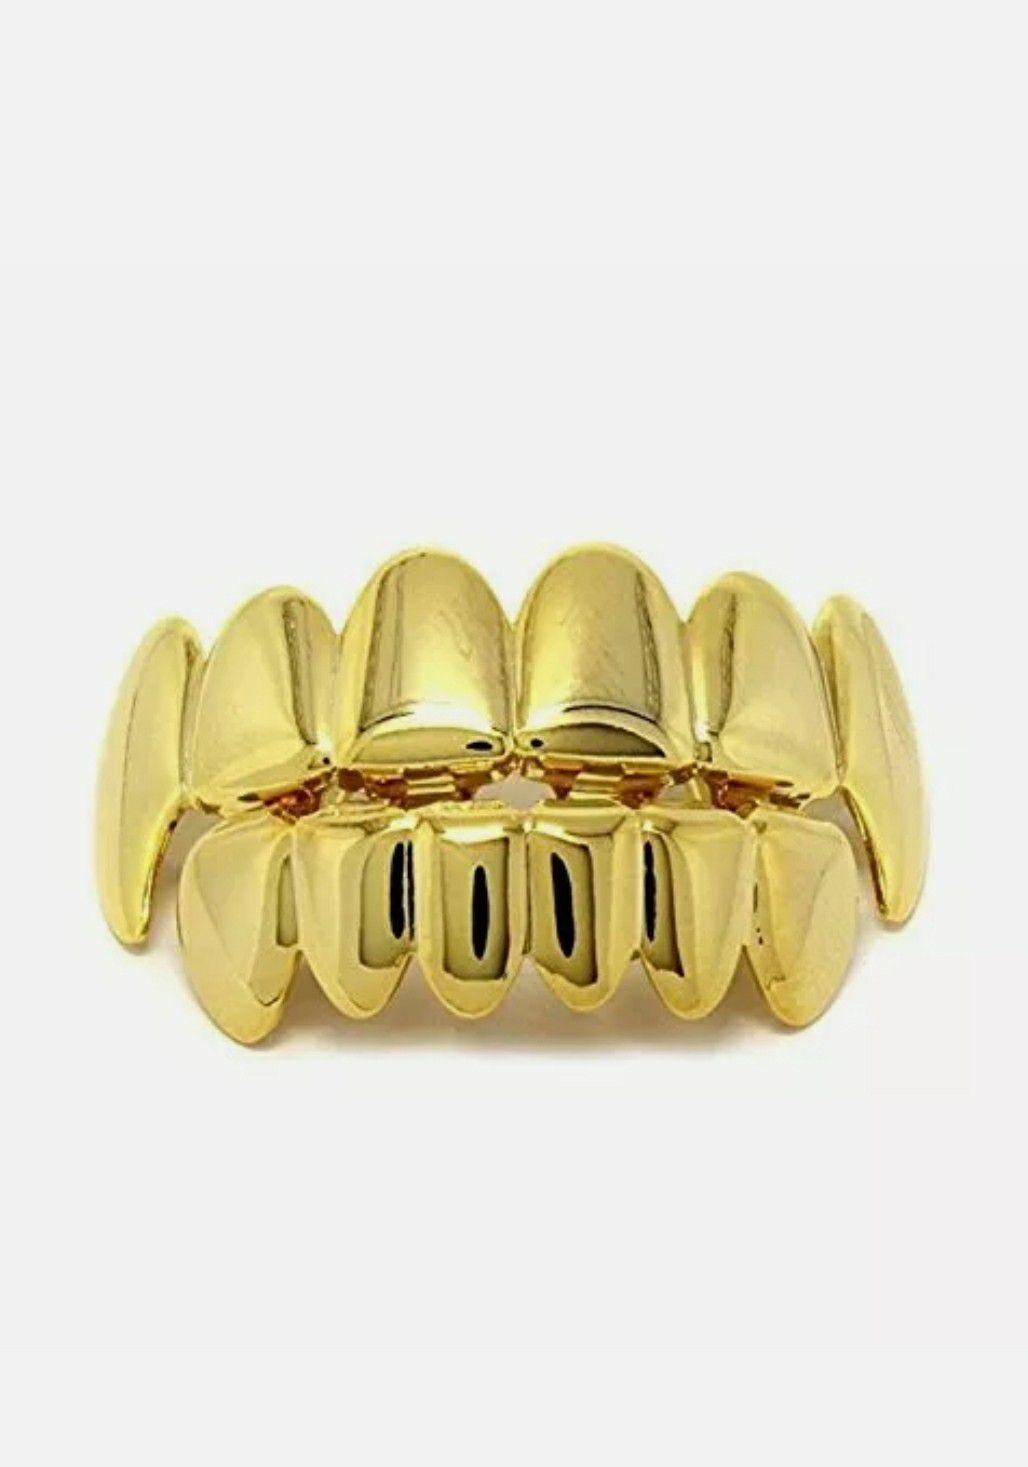 14k gold plated Hip Hop teeth Grillze caps top & bottom